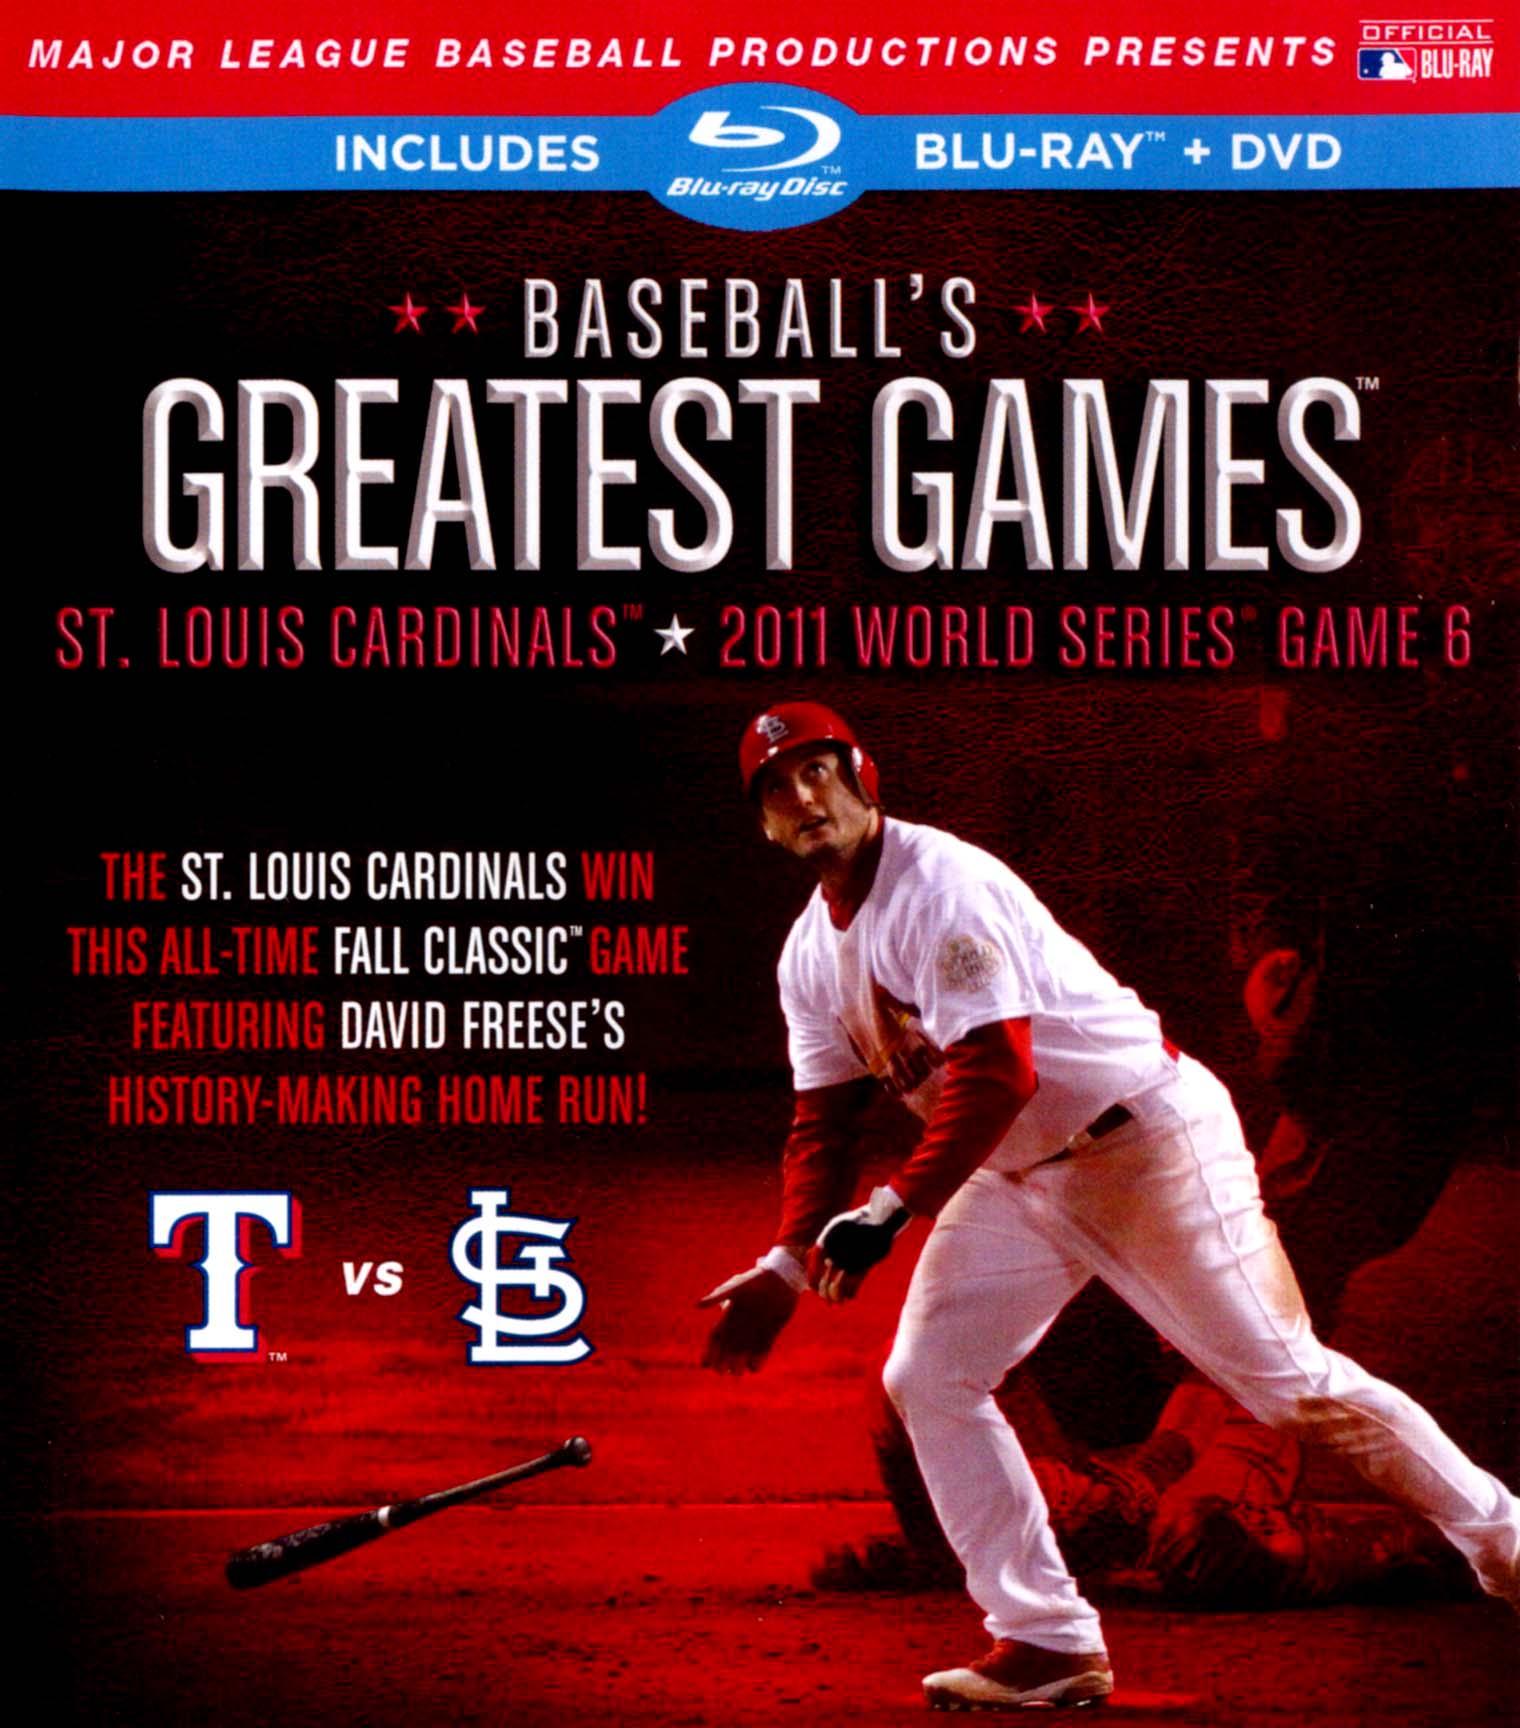 MLB: Baseball's Greatest Games - 2011 World Series Game 6